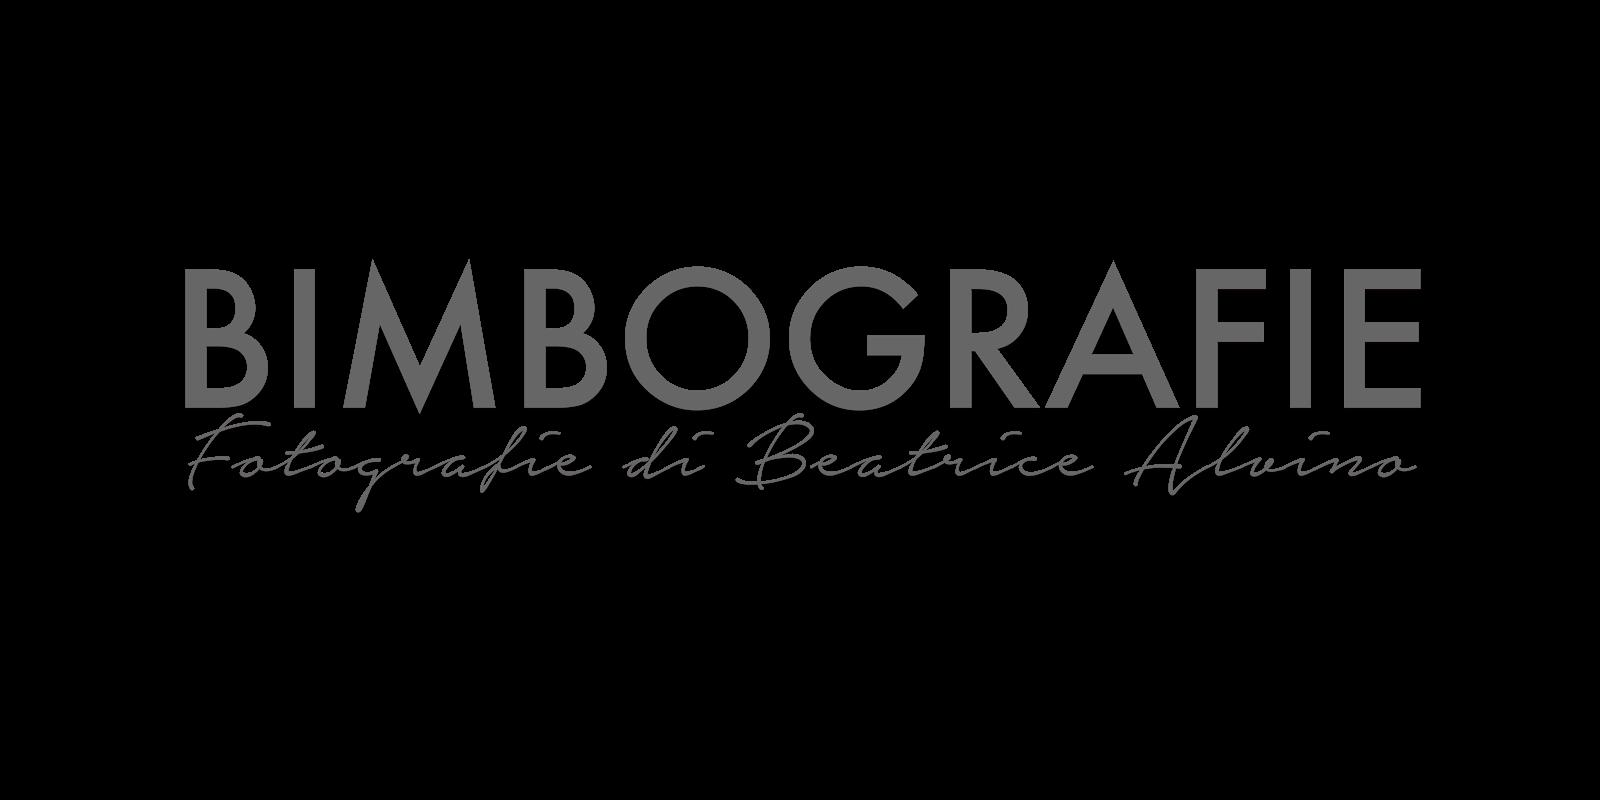 BIMBOGRAFIE di Beatrice Alvino - Fotografa bambini  Roma